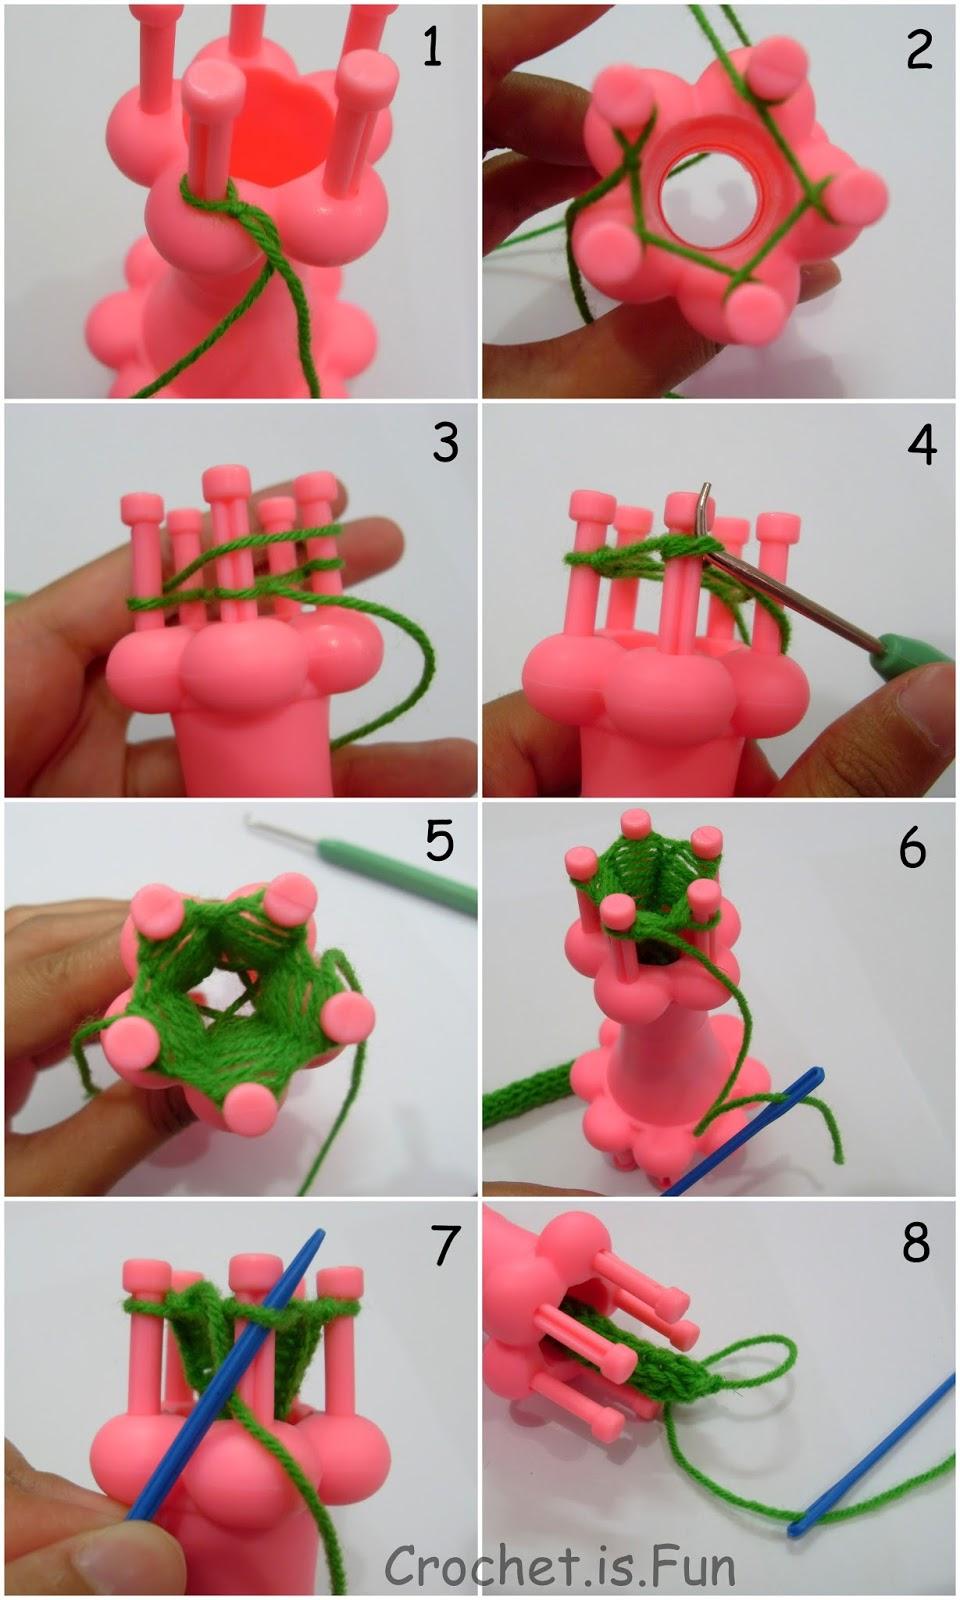 Crochet.is.Fun: Tutorial: How to spool knitting